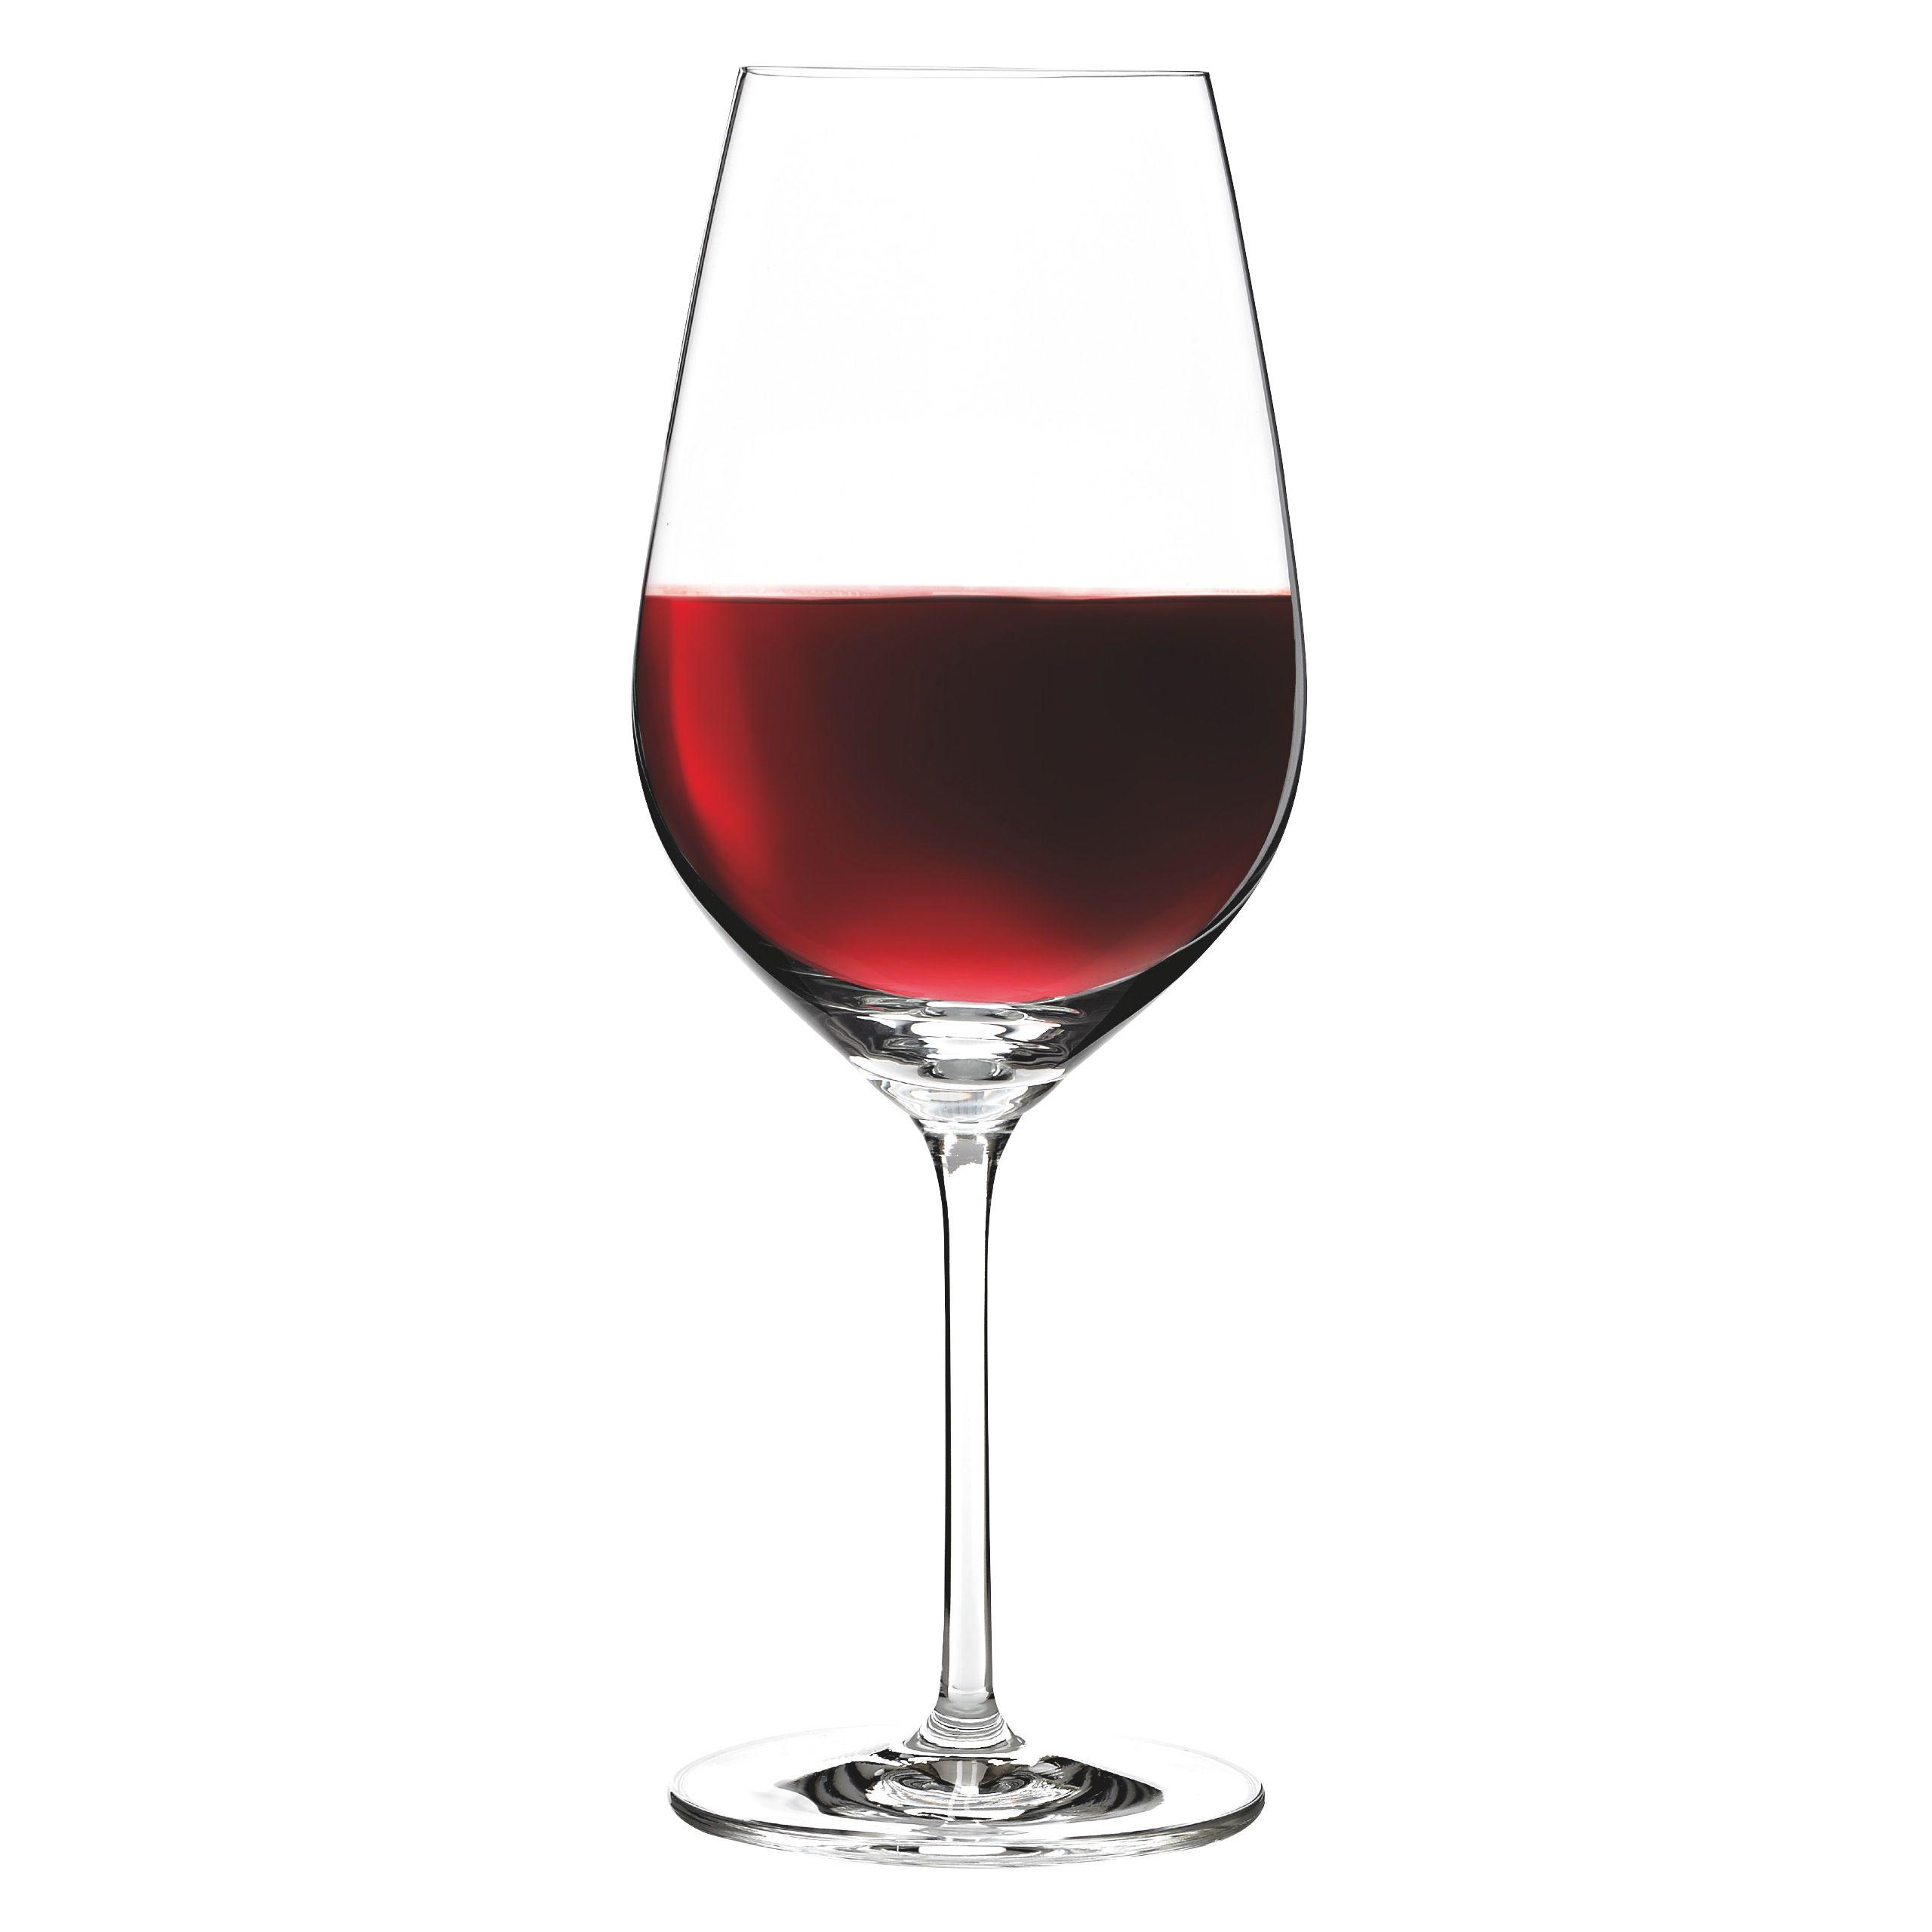 aspergo-6er-set-bordeauxglas-von-sykes-langlois-2830002